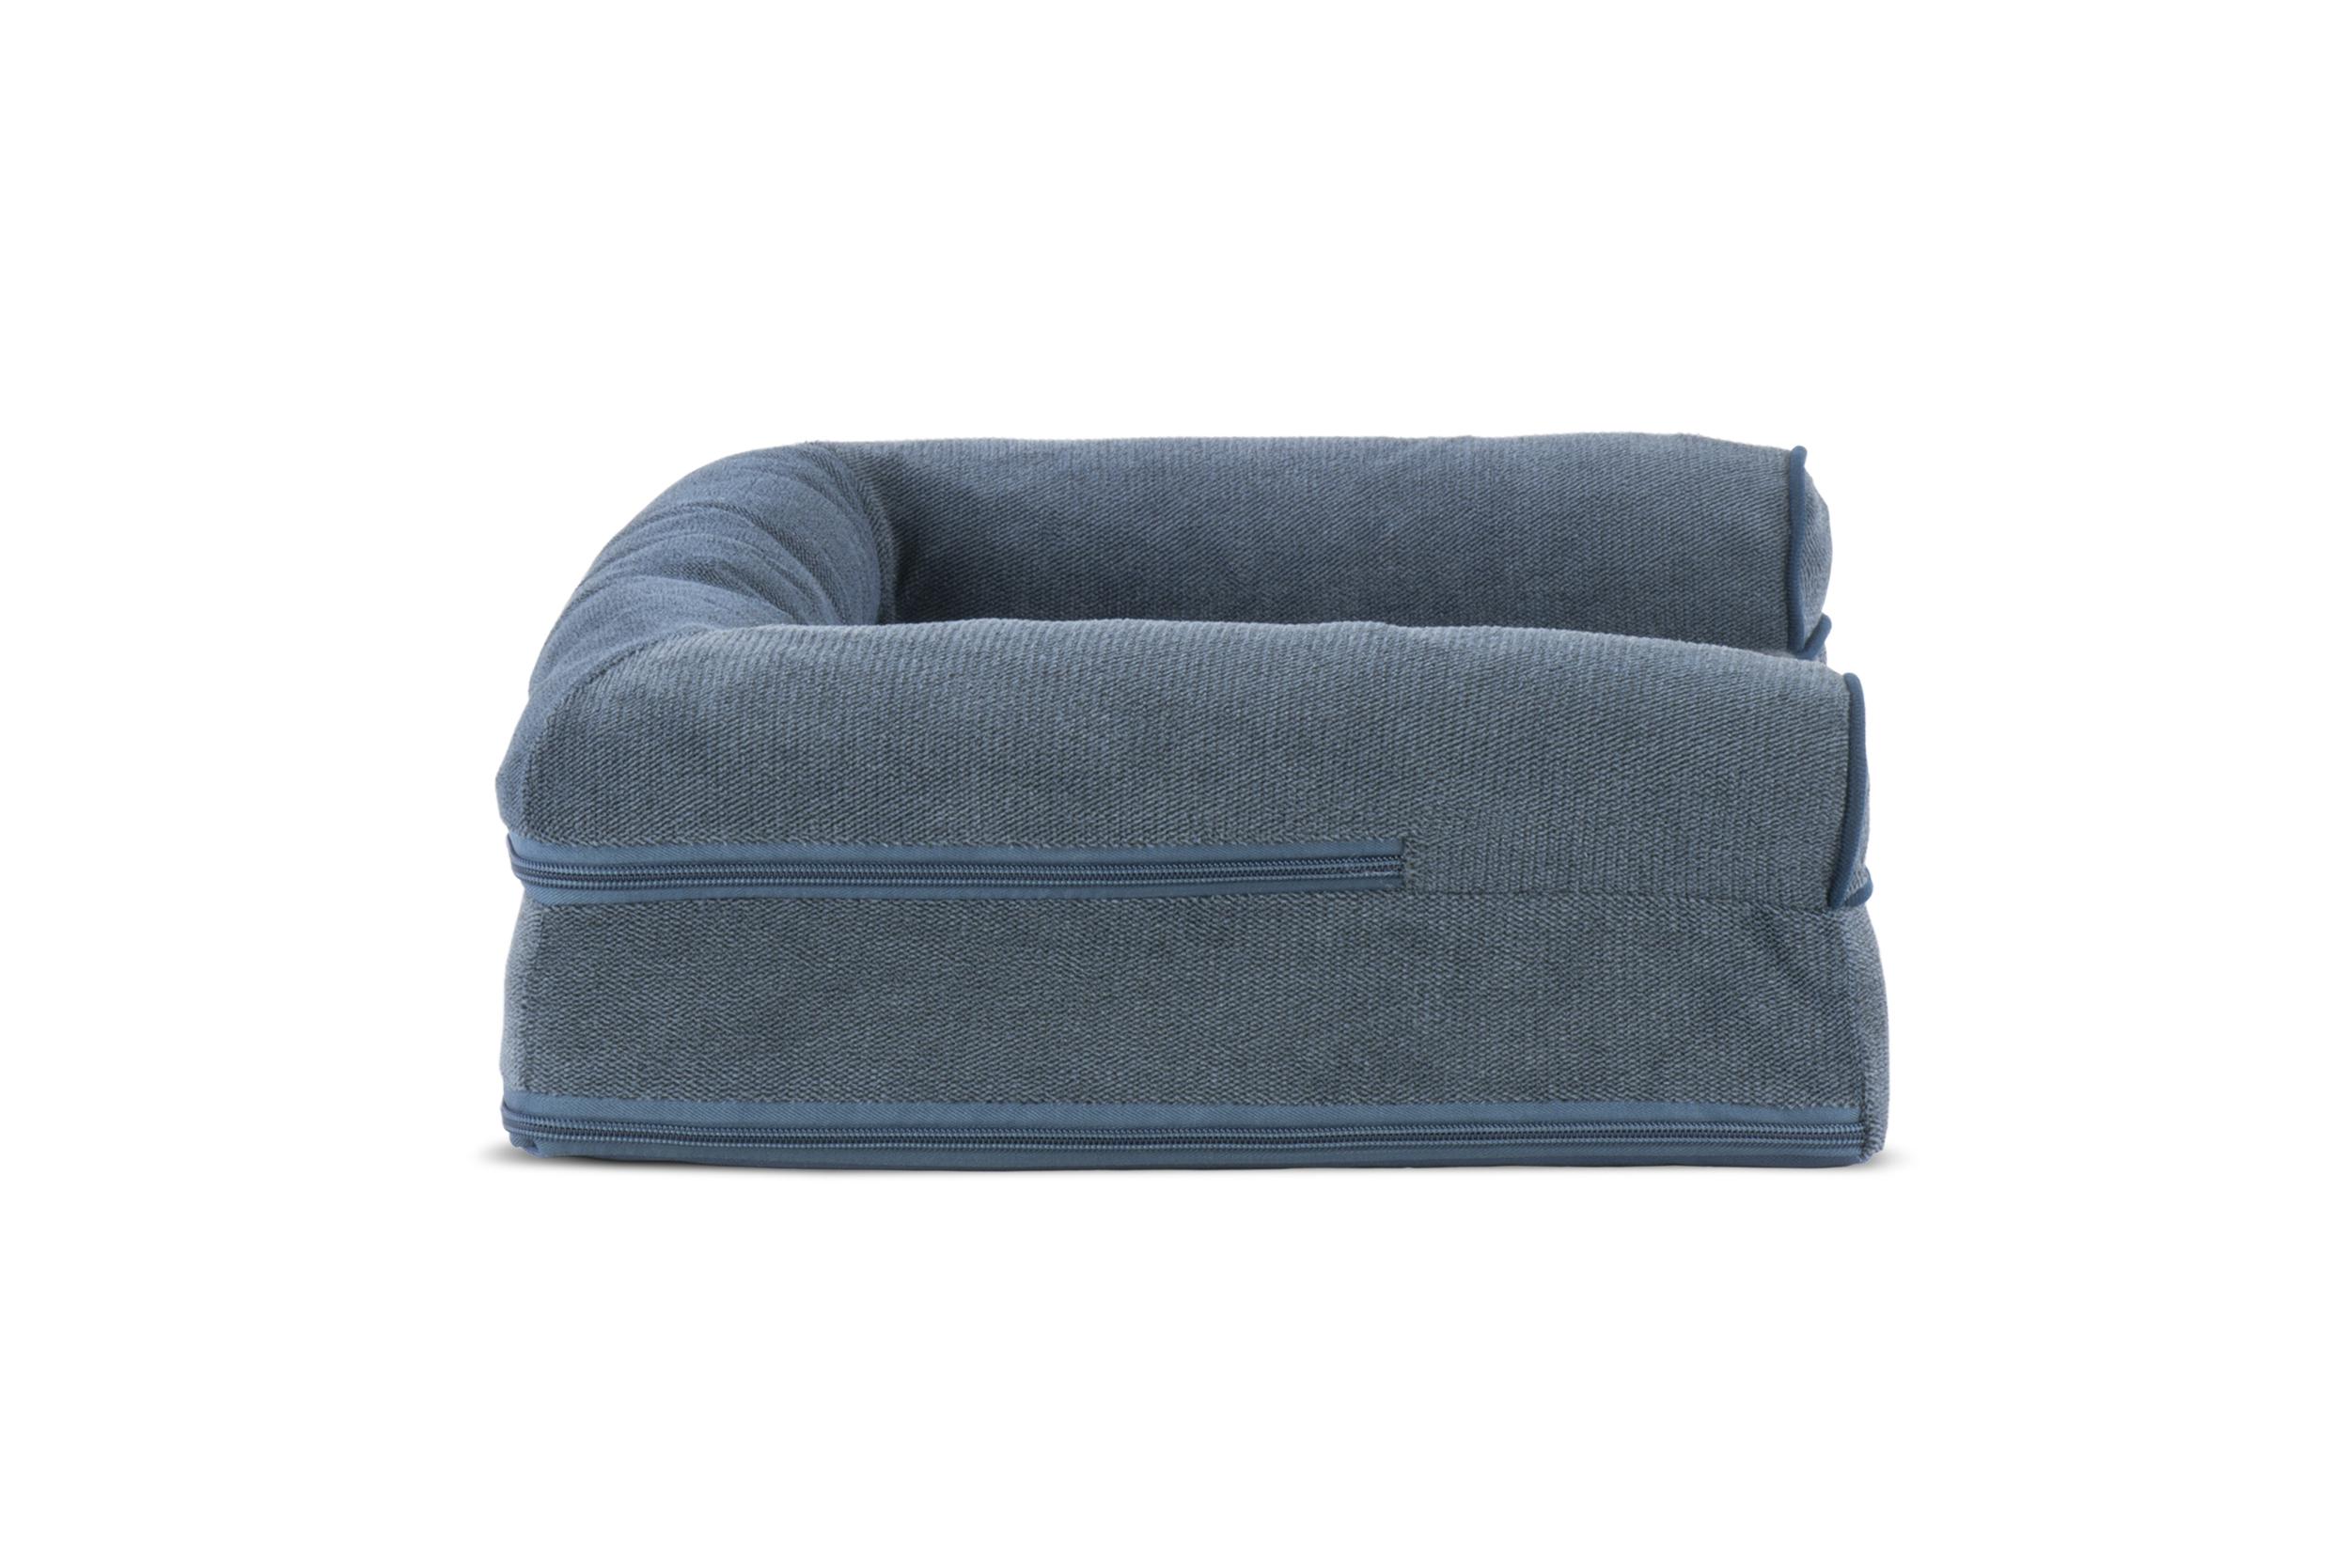 Faux Fleece Amp Chenille Soft Woven Memory Top Sofa Pet Bed